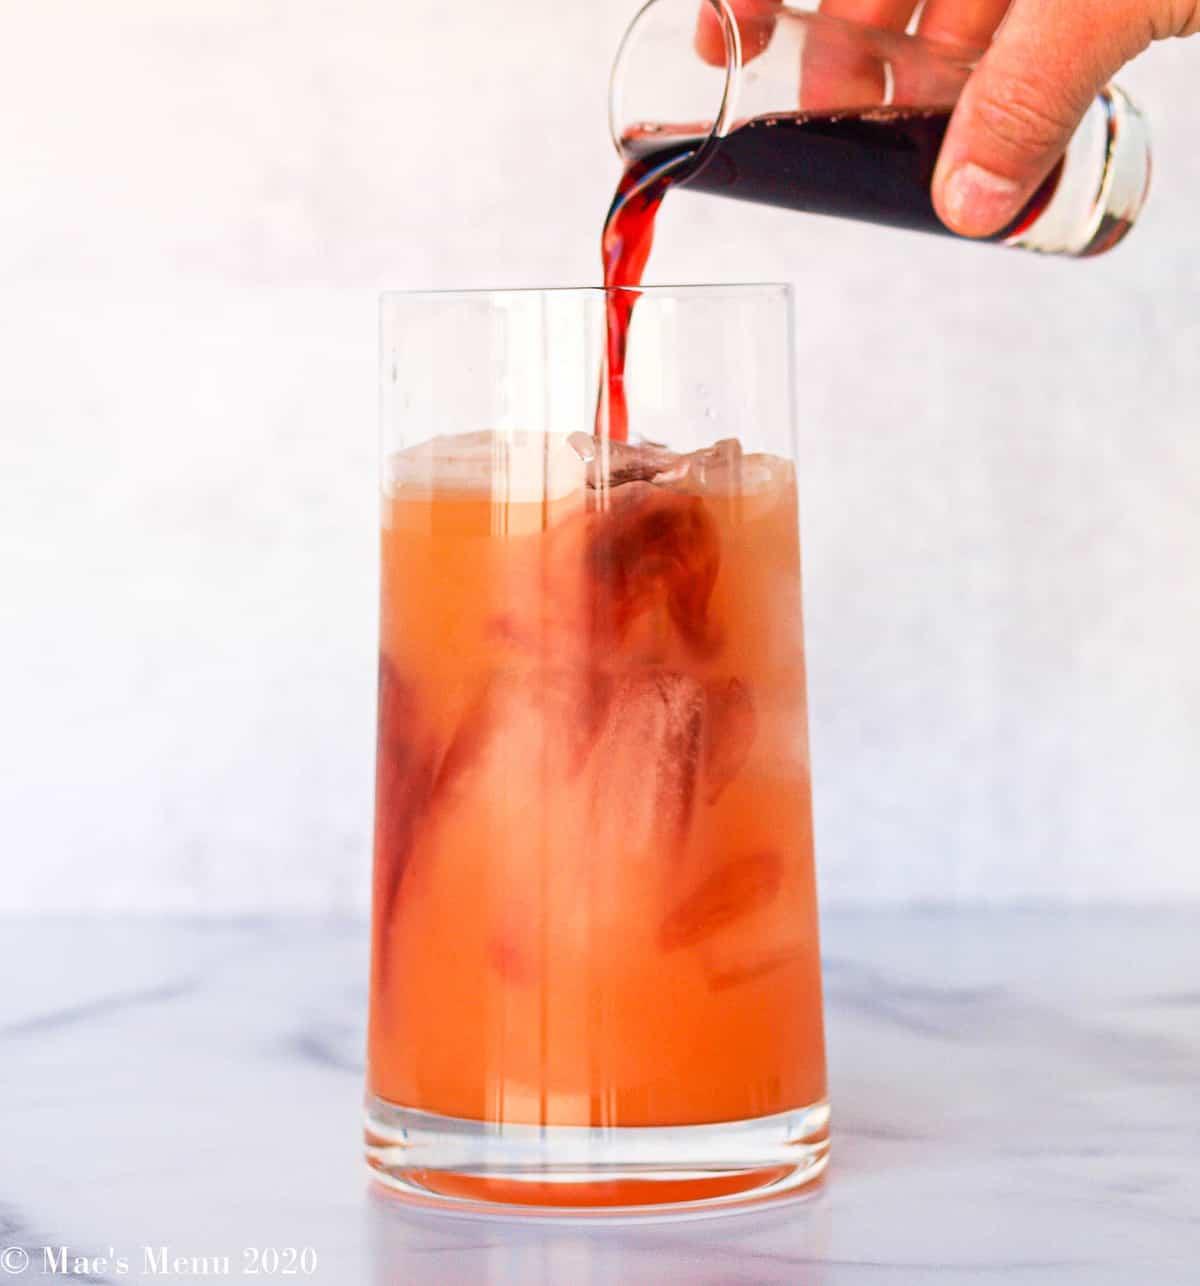 Pouring pomegranate juice into a glass of grapefruit juice